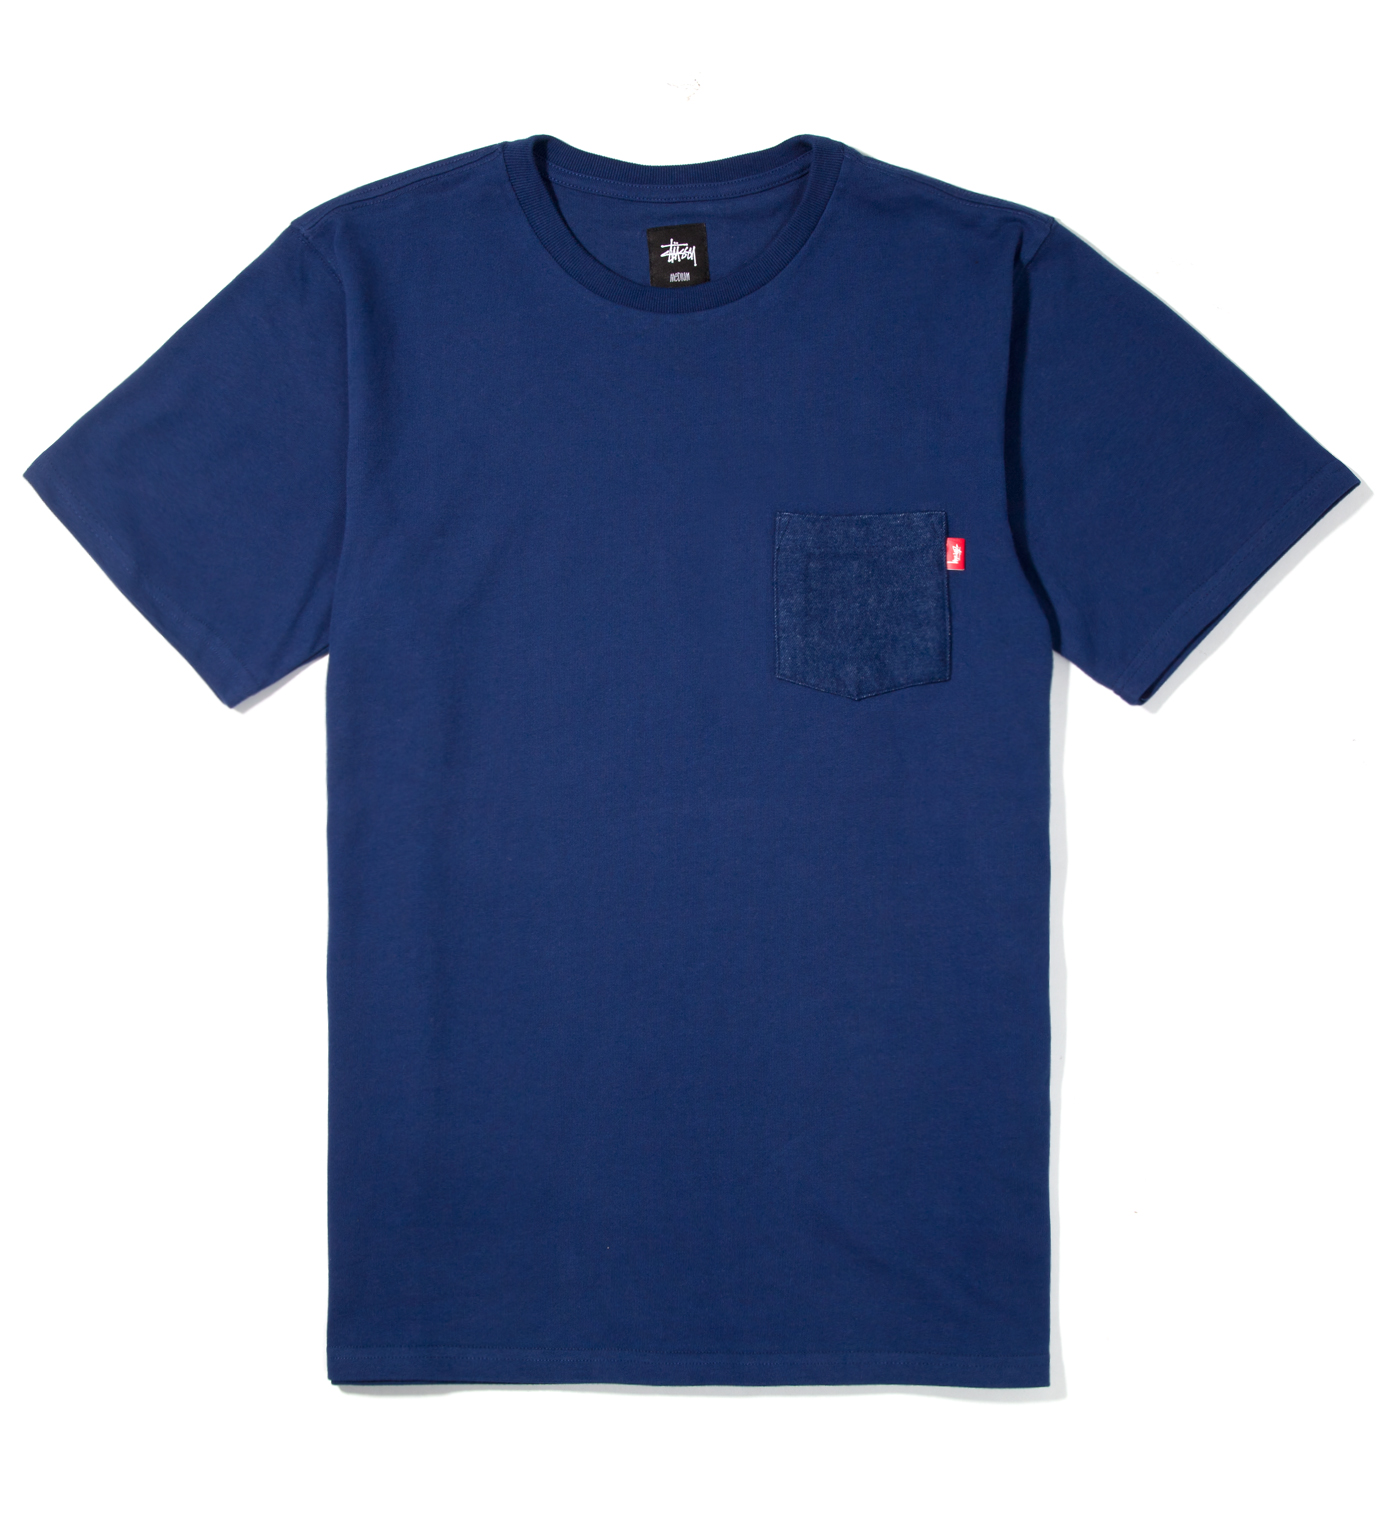 Stussy Navy Flannel Pocket T-Shirt